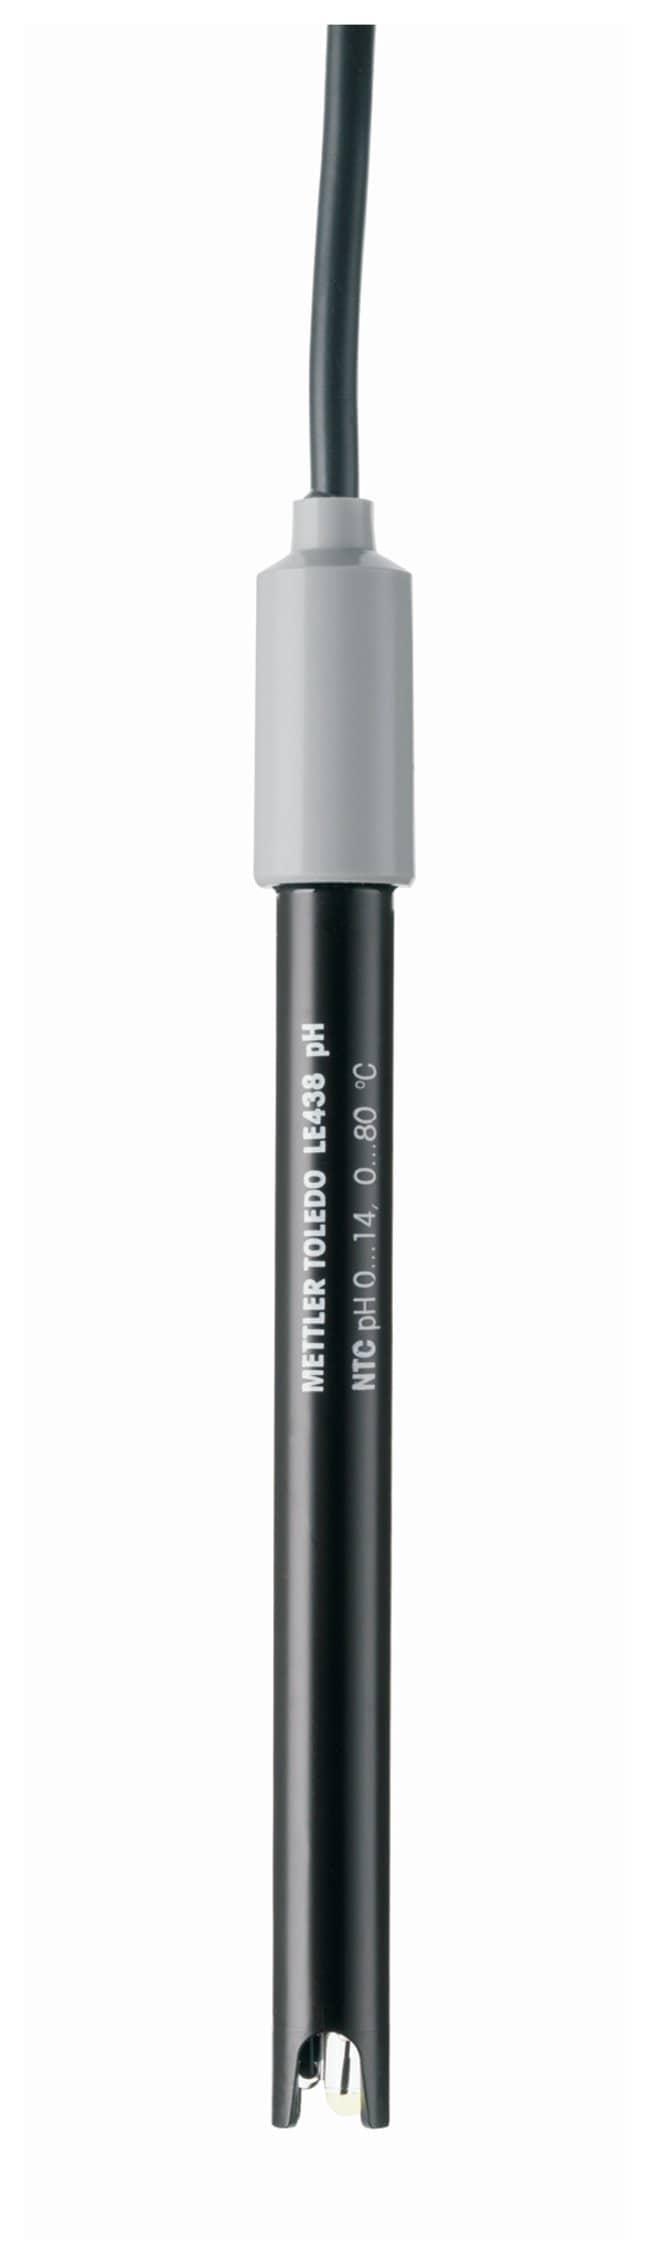 Mettler Toledo™LE pH Electrode LE438-IP67 for FiveGo™ pH/Conductivity/DO Meter LE438 sensor; IP67 waterproof pH Meter Accessories